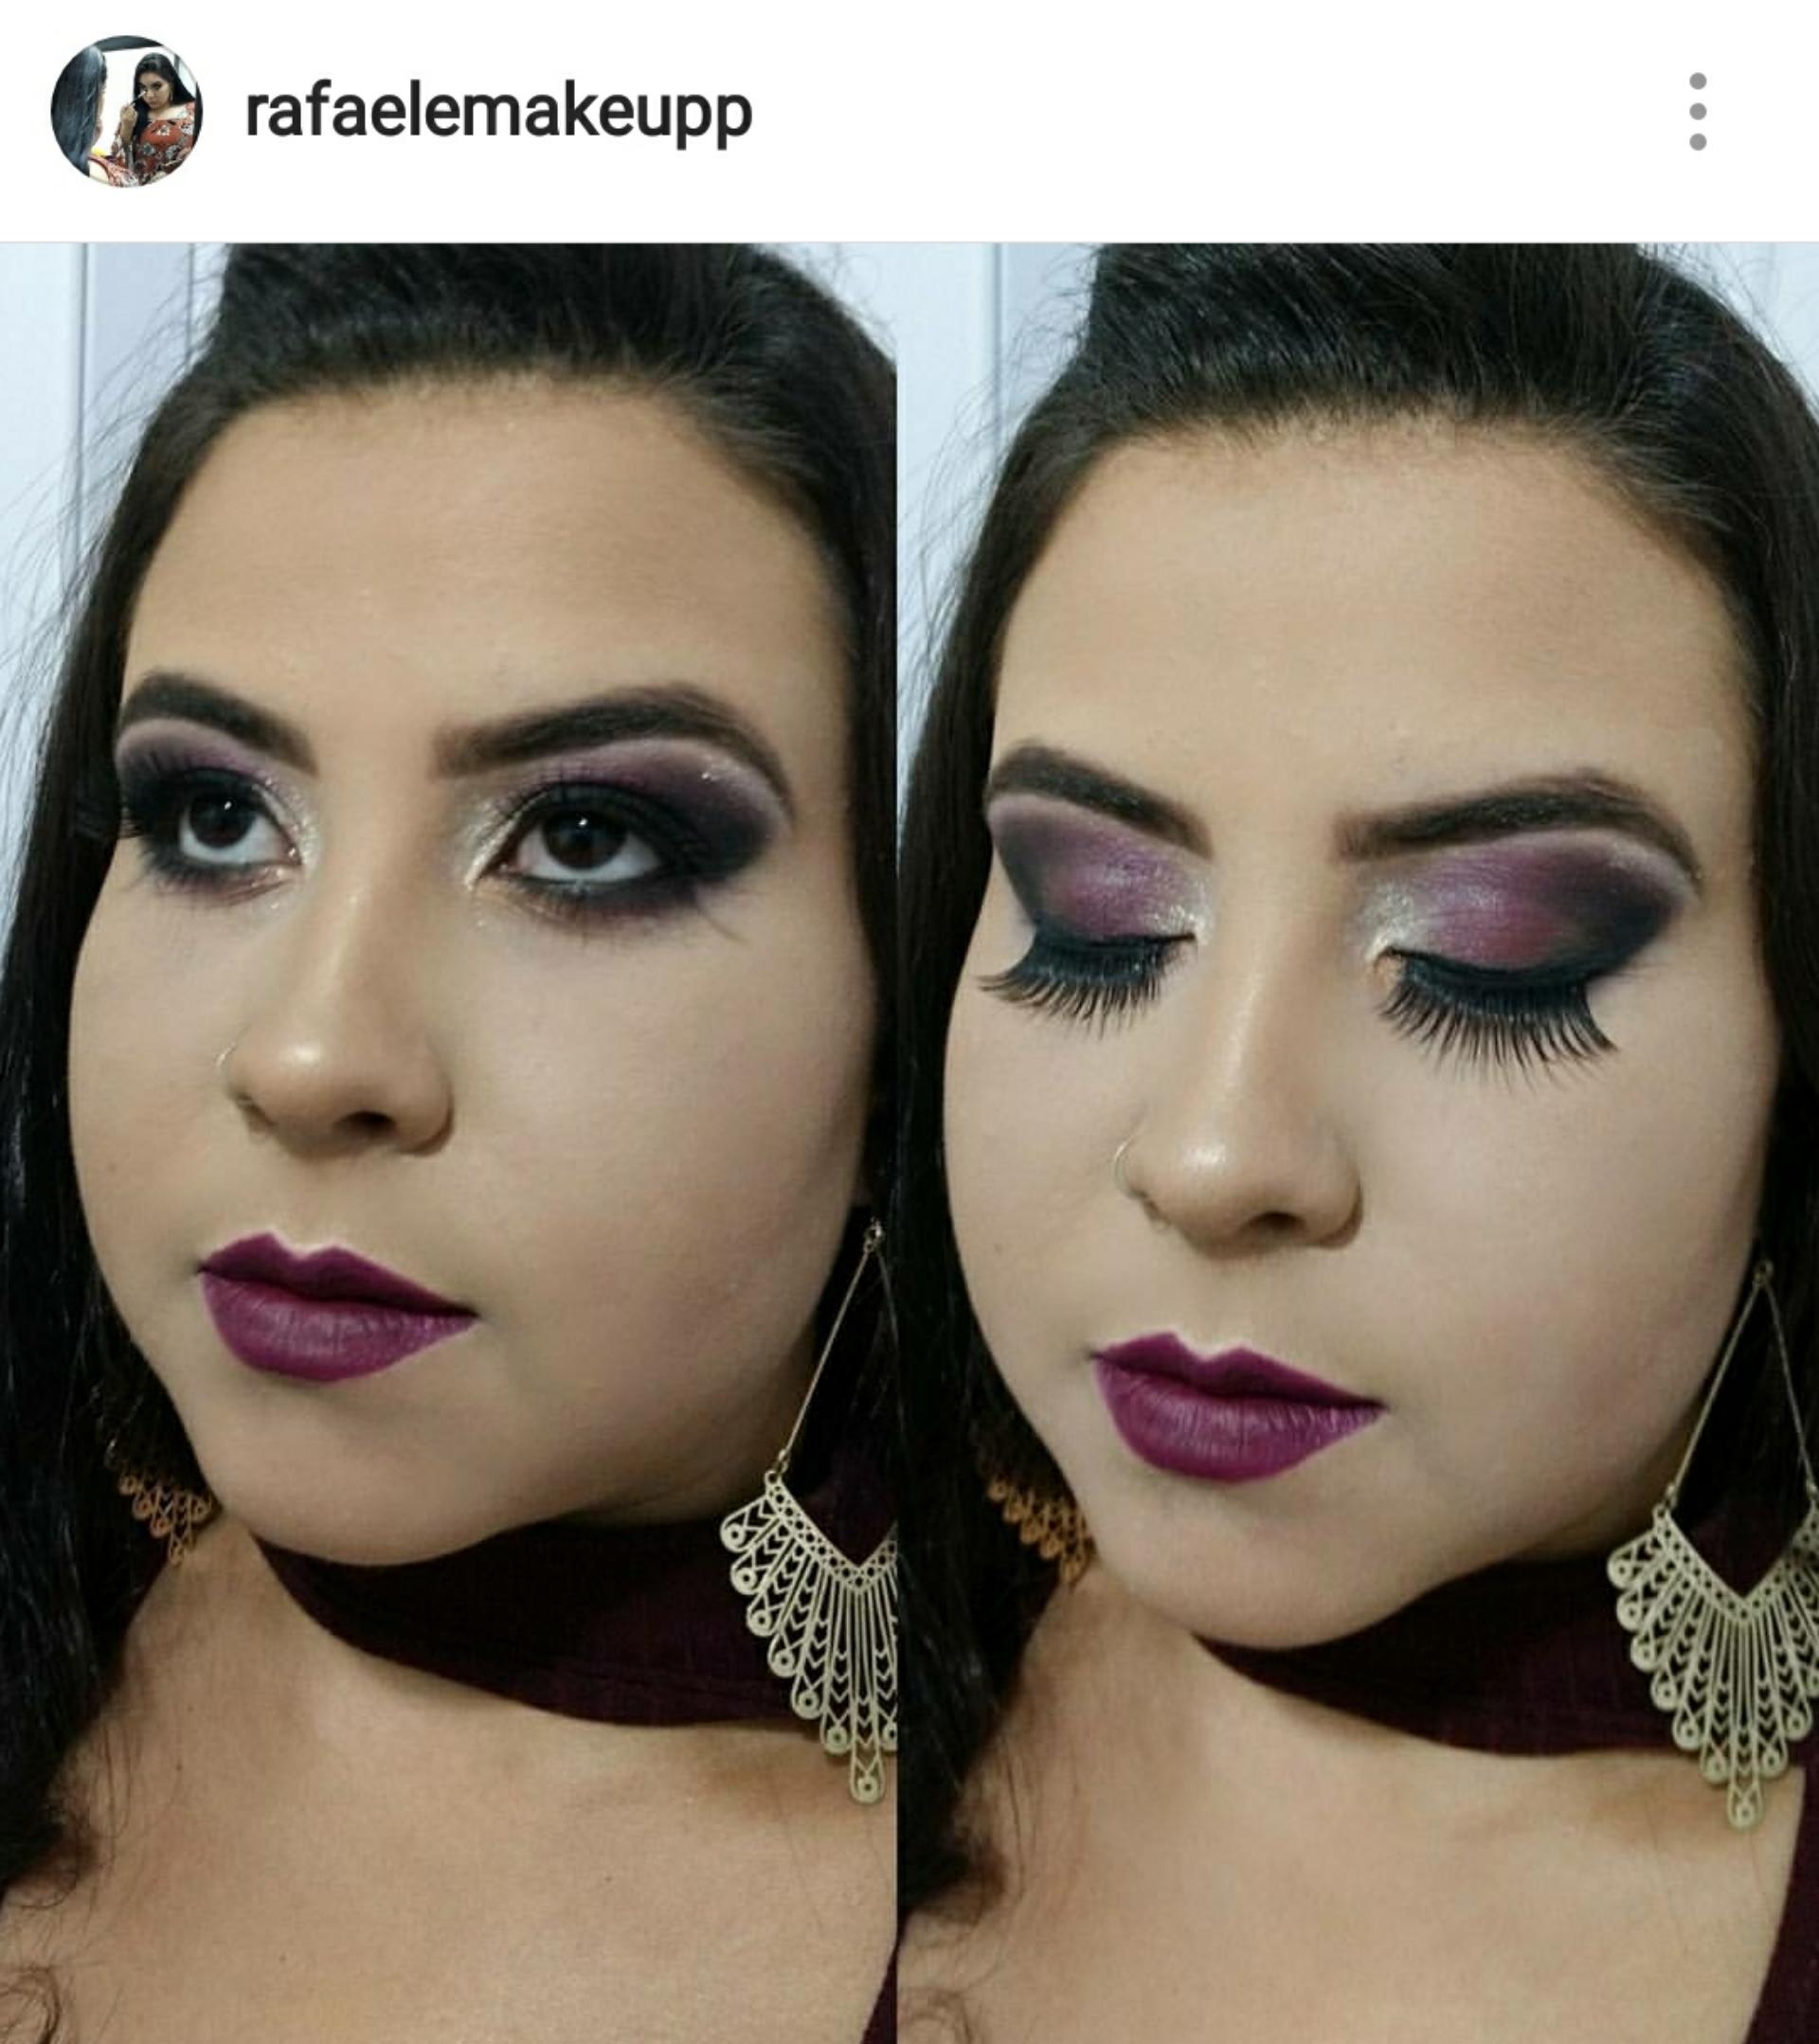 #Maquiagem #Maquiadora #MaquiagemProfissinal #MaquiagemNoiva #MaquiagemDebutante #MaquiagemCasual #MaquiagemFesta maquiagem maquiador(a)